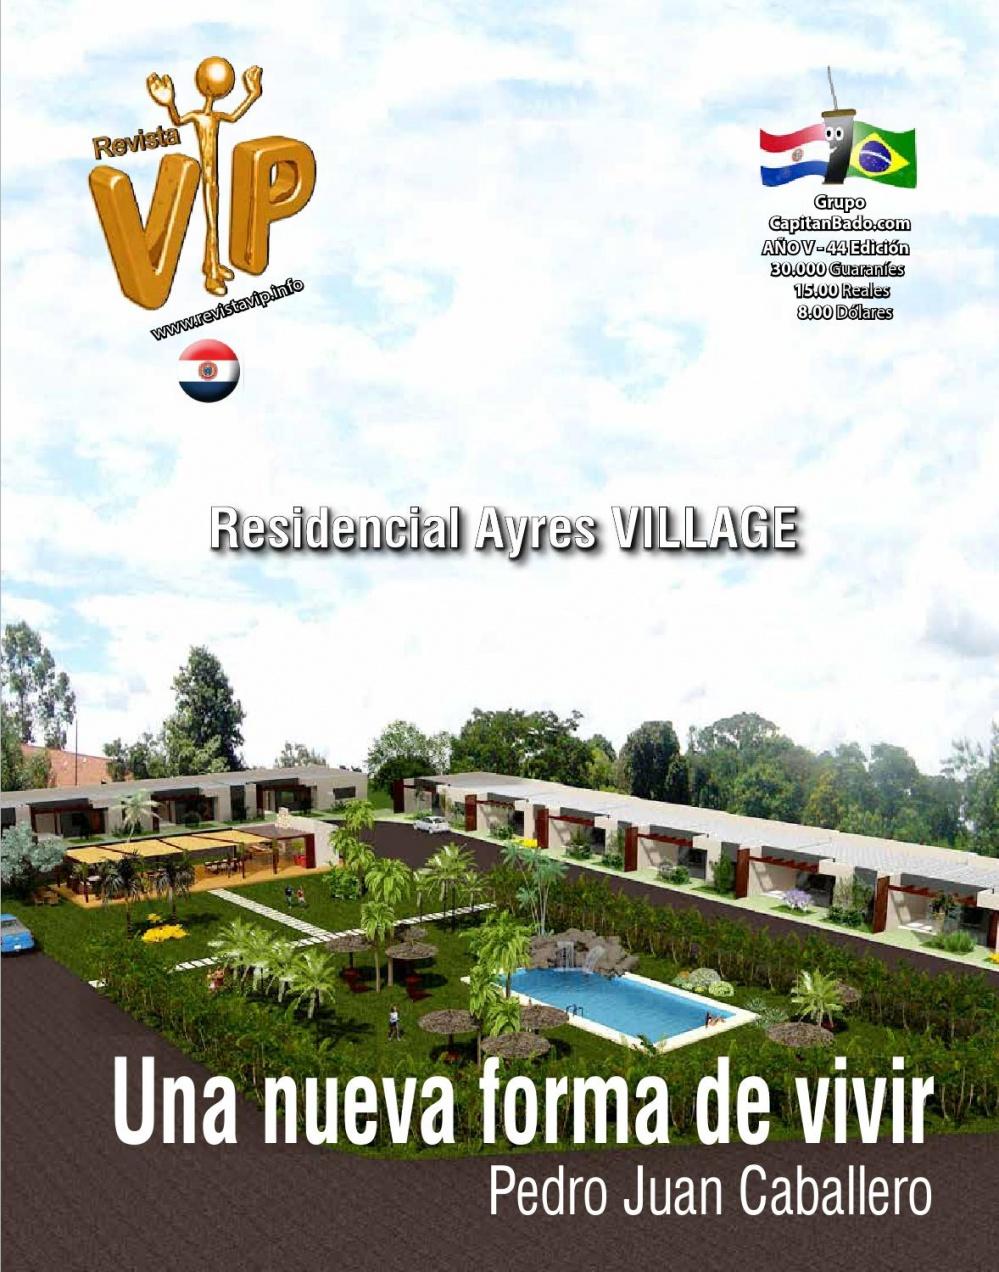 Vip 44 Paraguay